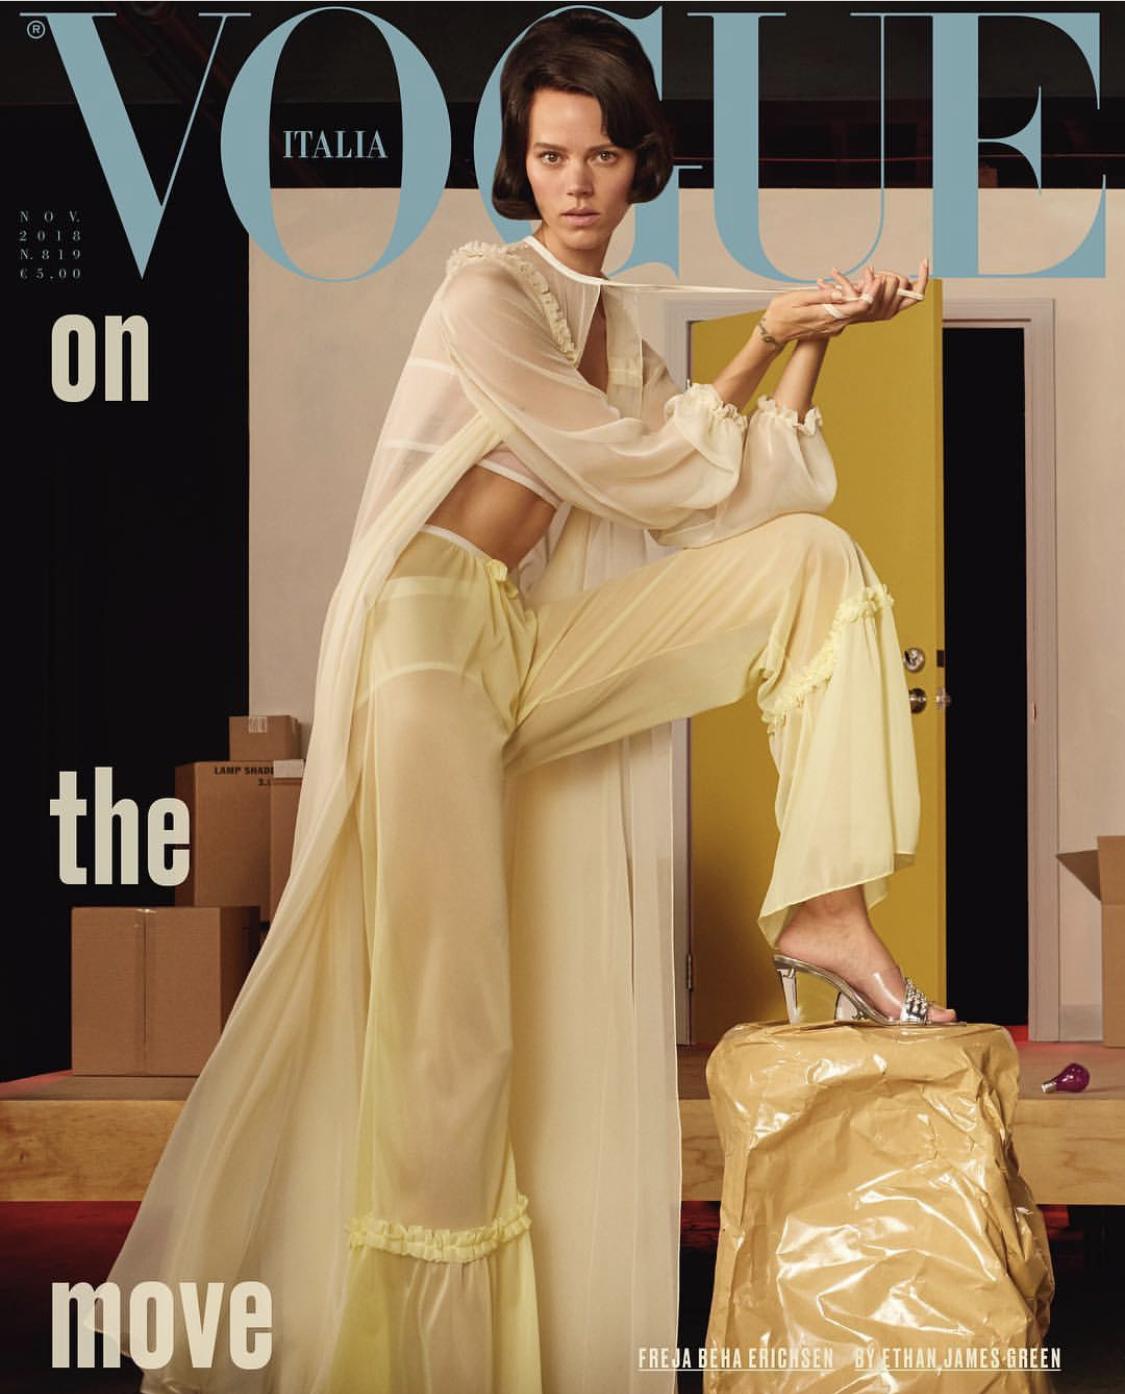 Italian Vogue Nov 2018 1.jpeg